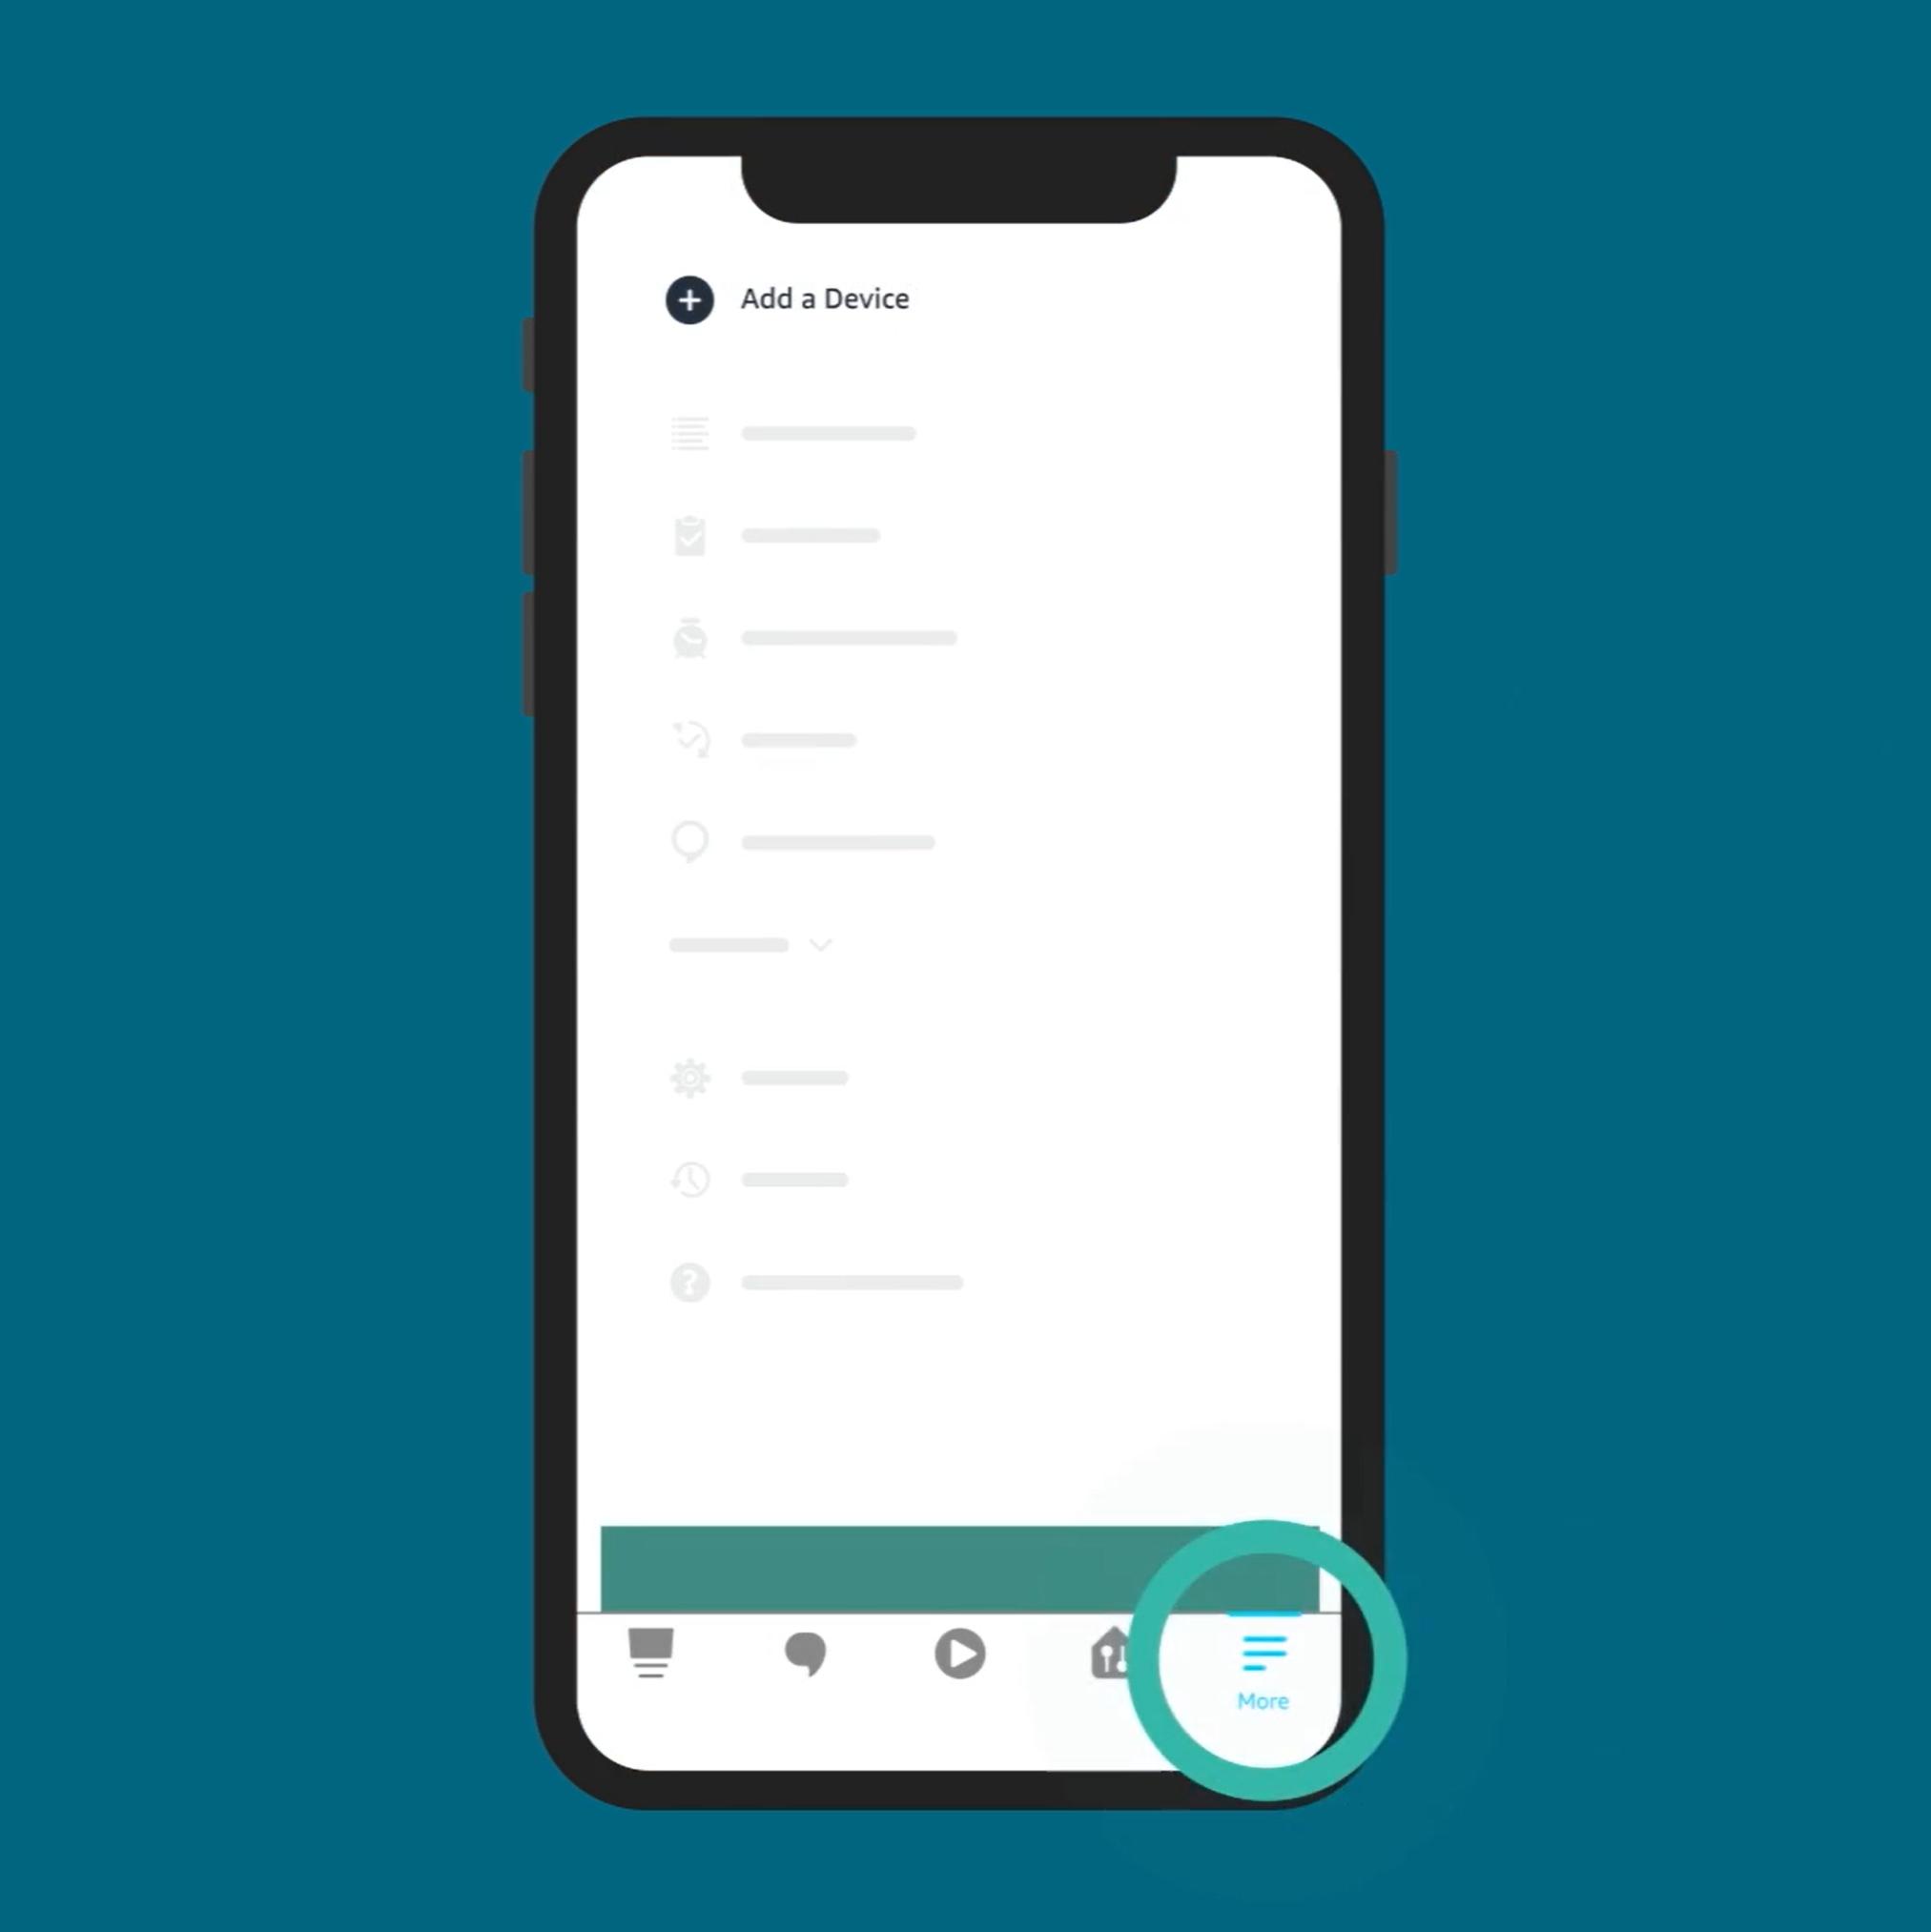 Amazon Alexa app add more button